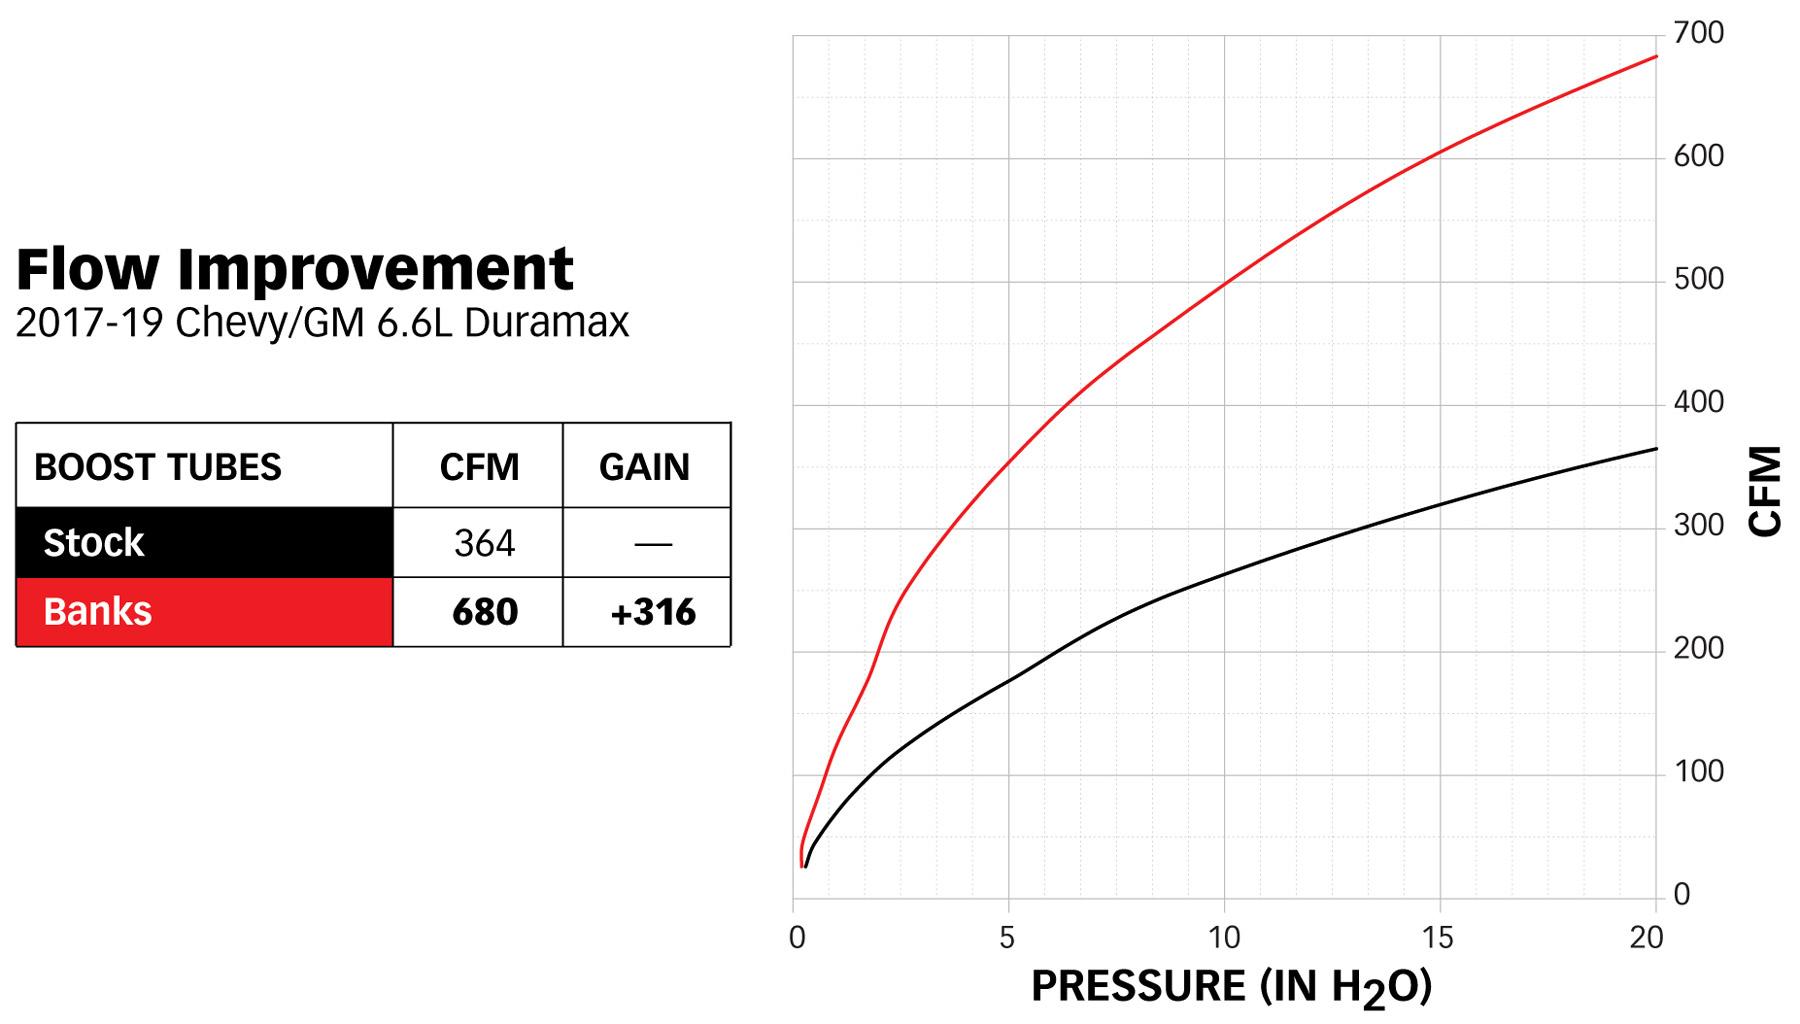 Banks Power Boost Tube CFM chart for 25999 Duramax 6.6L